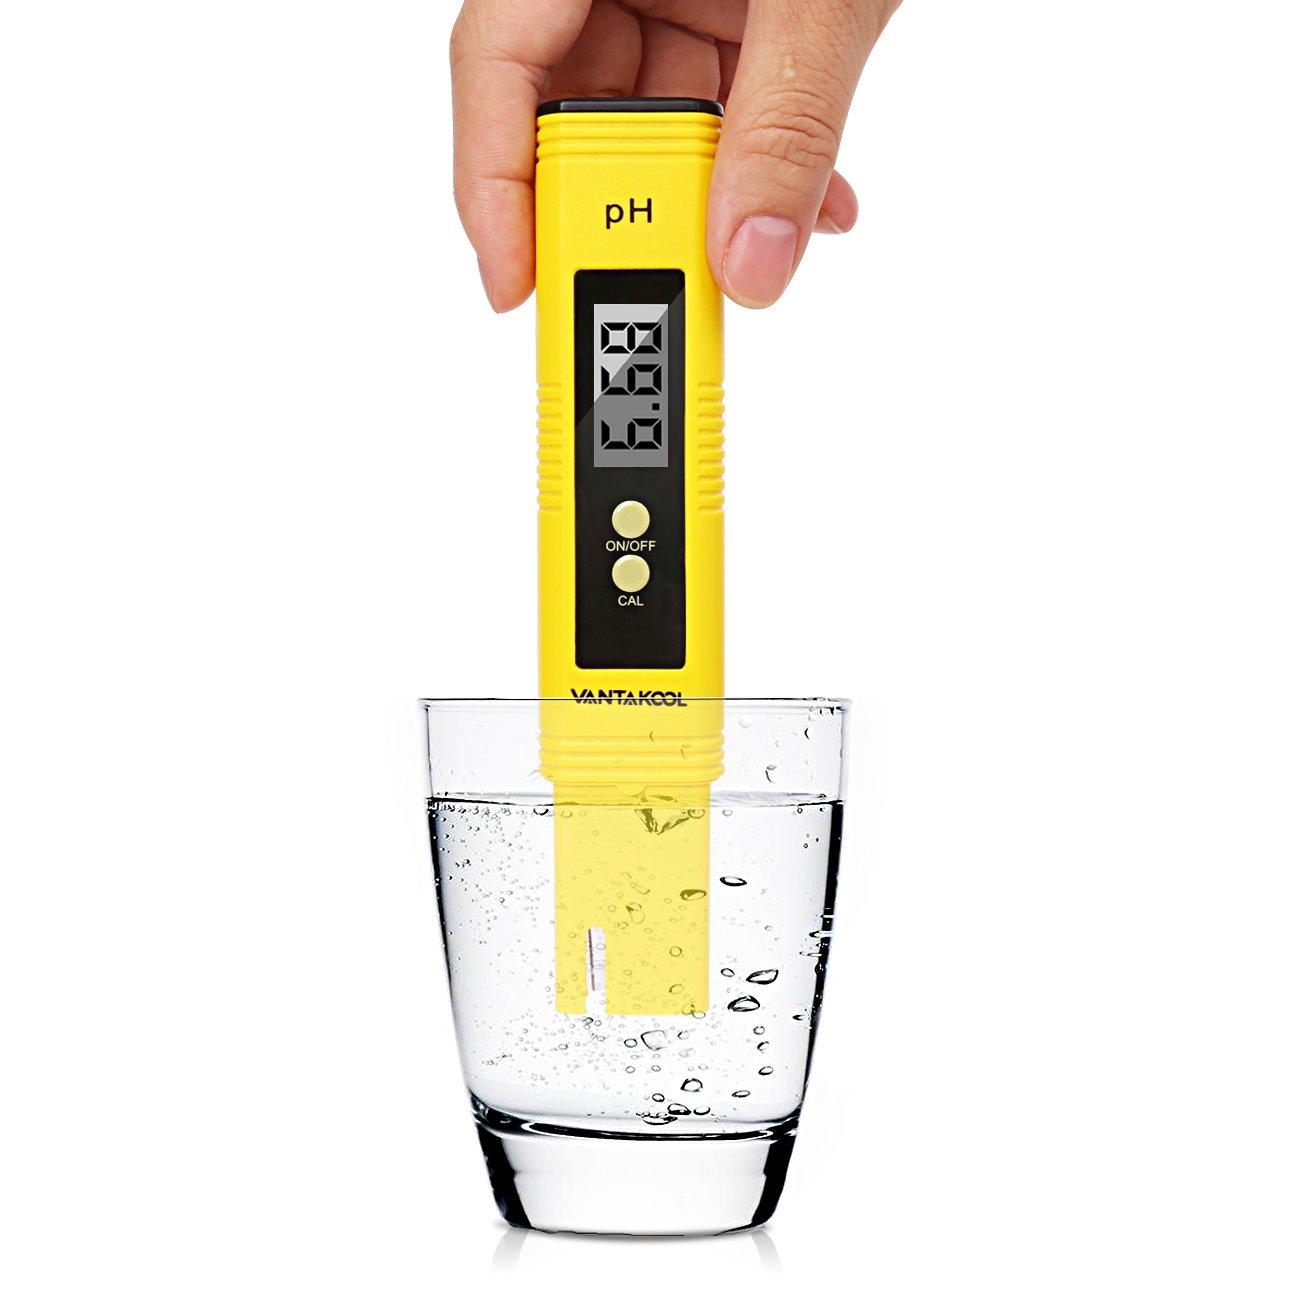 VANTAKOOL Digital PH Meter, 0.01 PH High Accuracy Water Quality Tester with 0-14 PH Measurement Range for Household Drinking, Pool and Aquarium Water PH Tester Design with ATC (yellow) by VantaKool (Image #1)